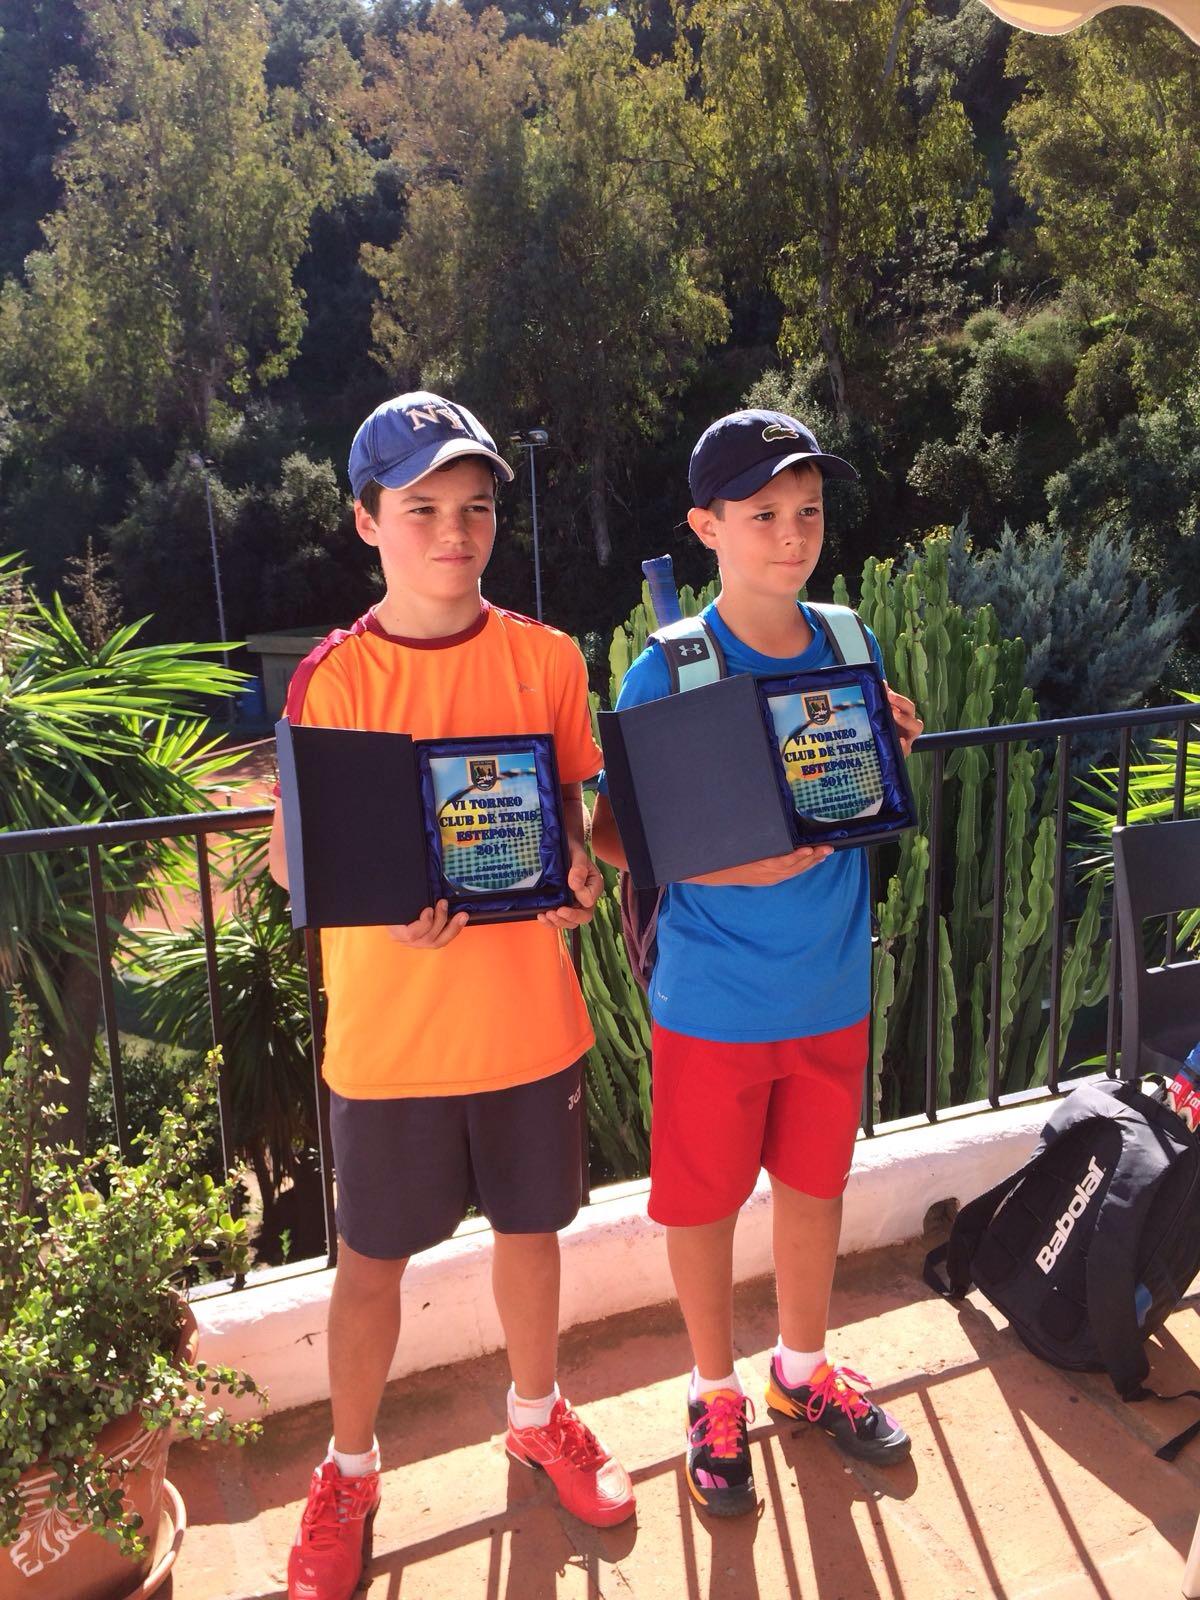 Enhorabuena al joven jugador Jacob Warwick